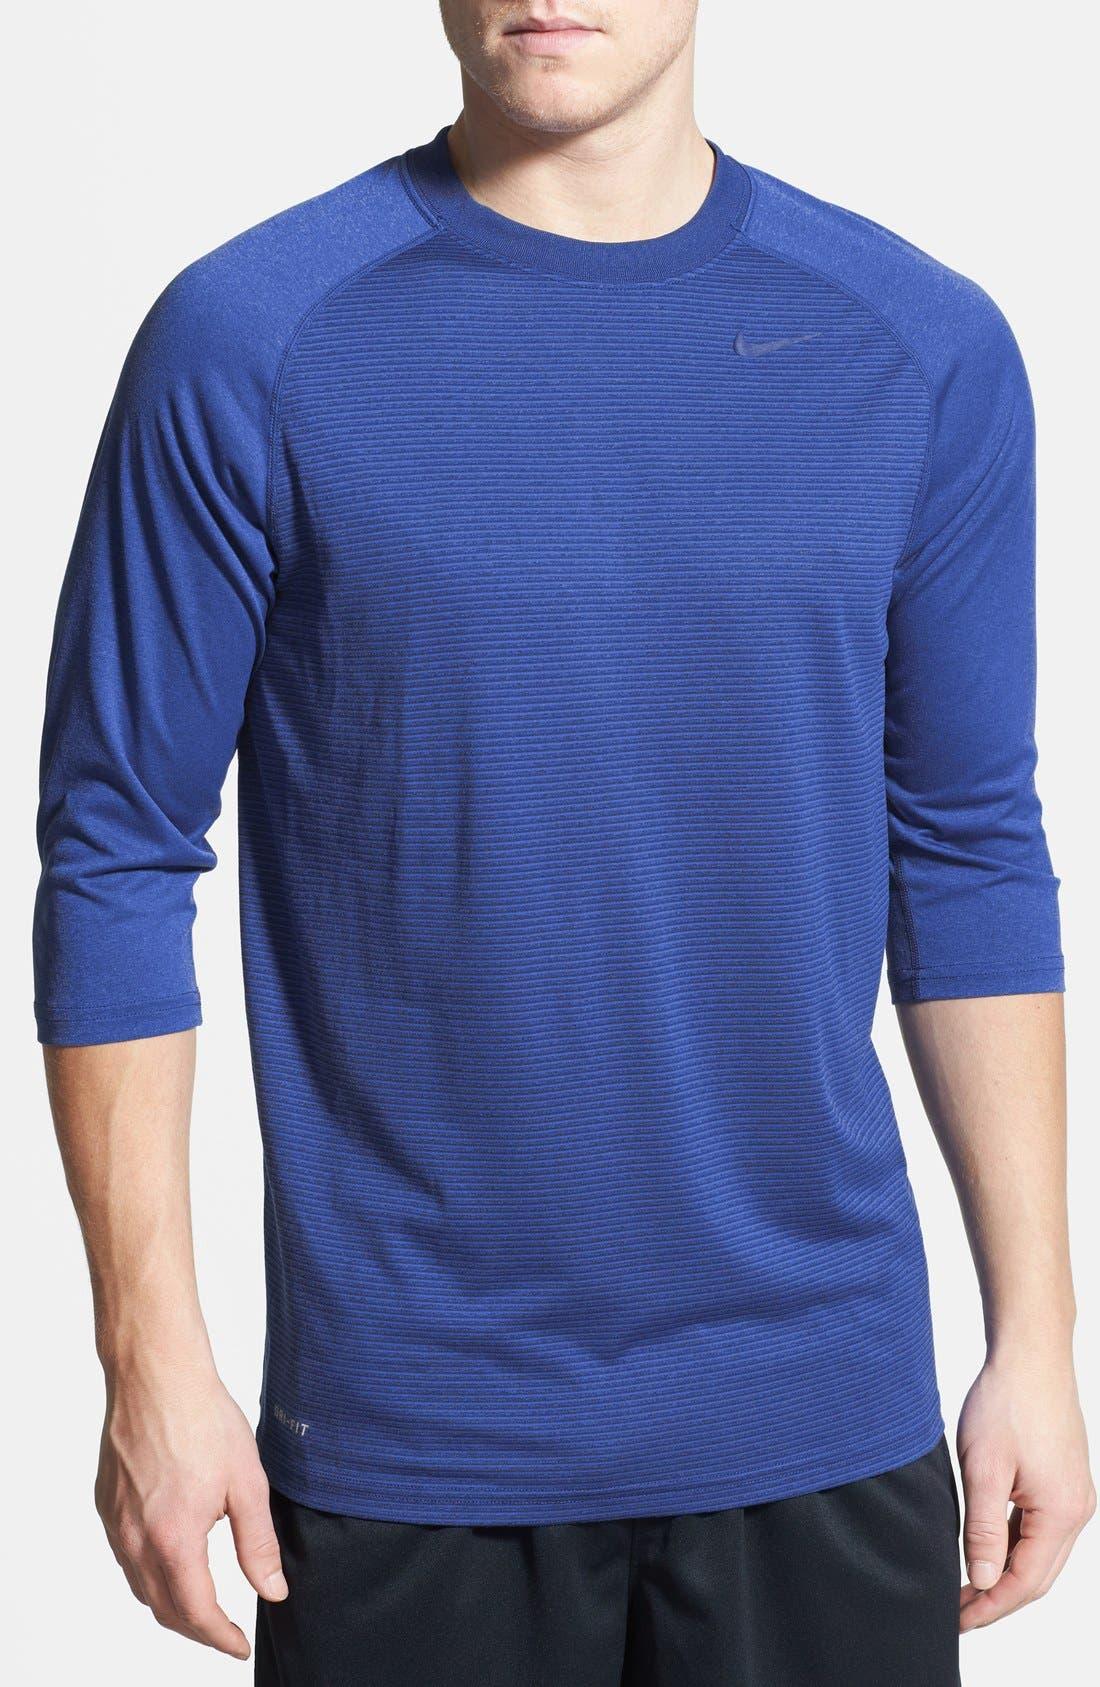 Alternate Image 1 Selected - Nike Dri-FIT Three Quarter Length Raglan Sleeve T-Shirt